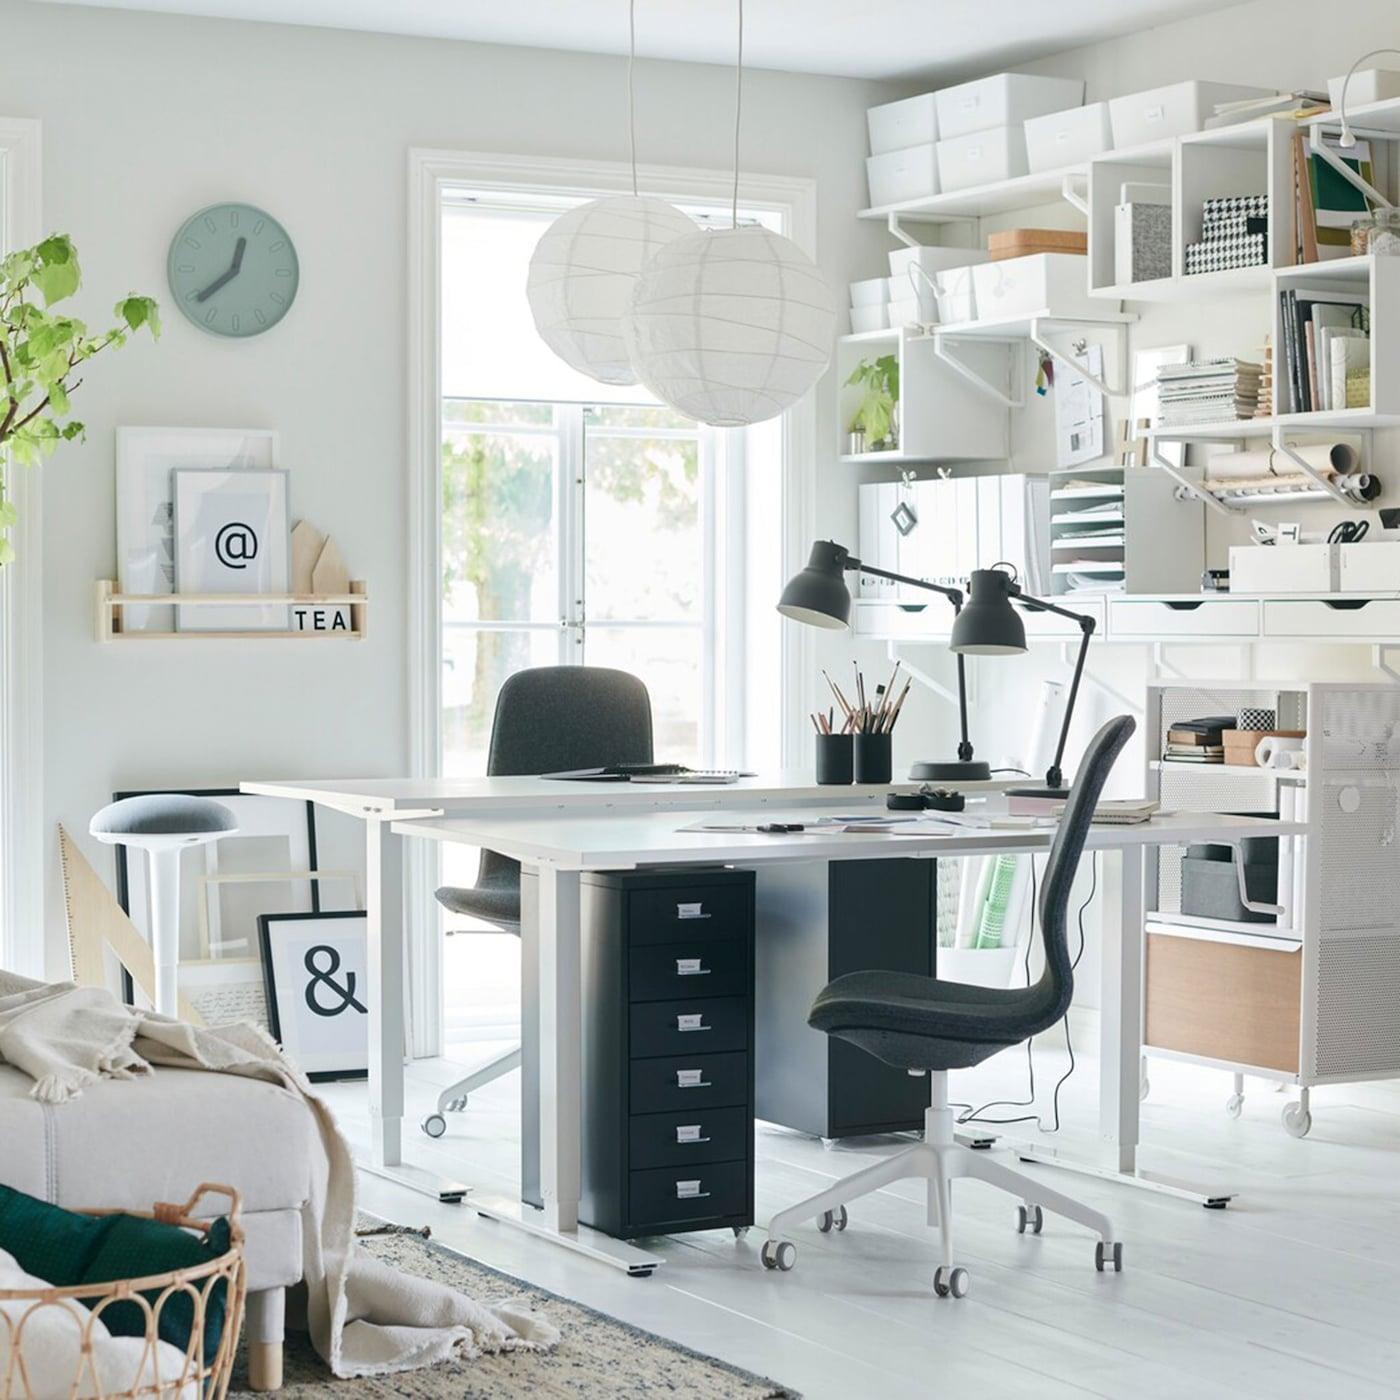 ikea home office ikea rh ikea com office furniture white plains ny office furniture white plains